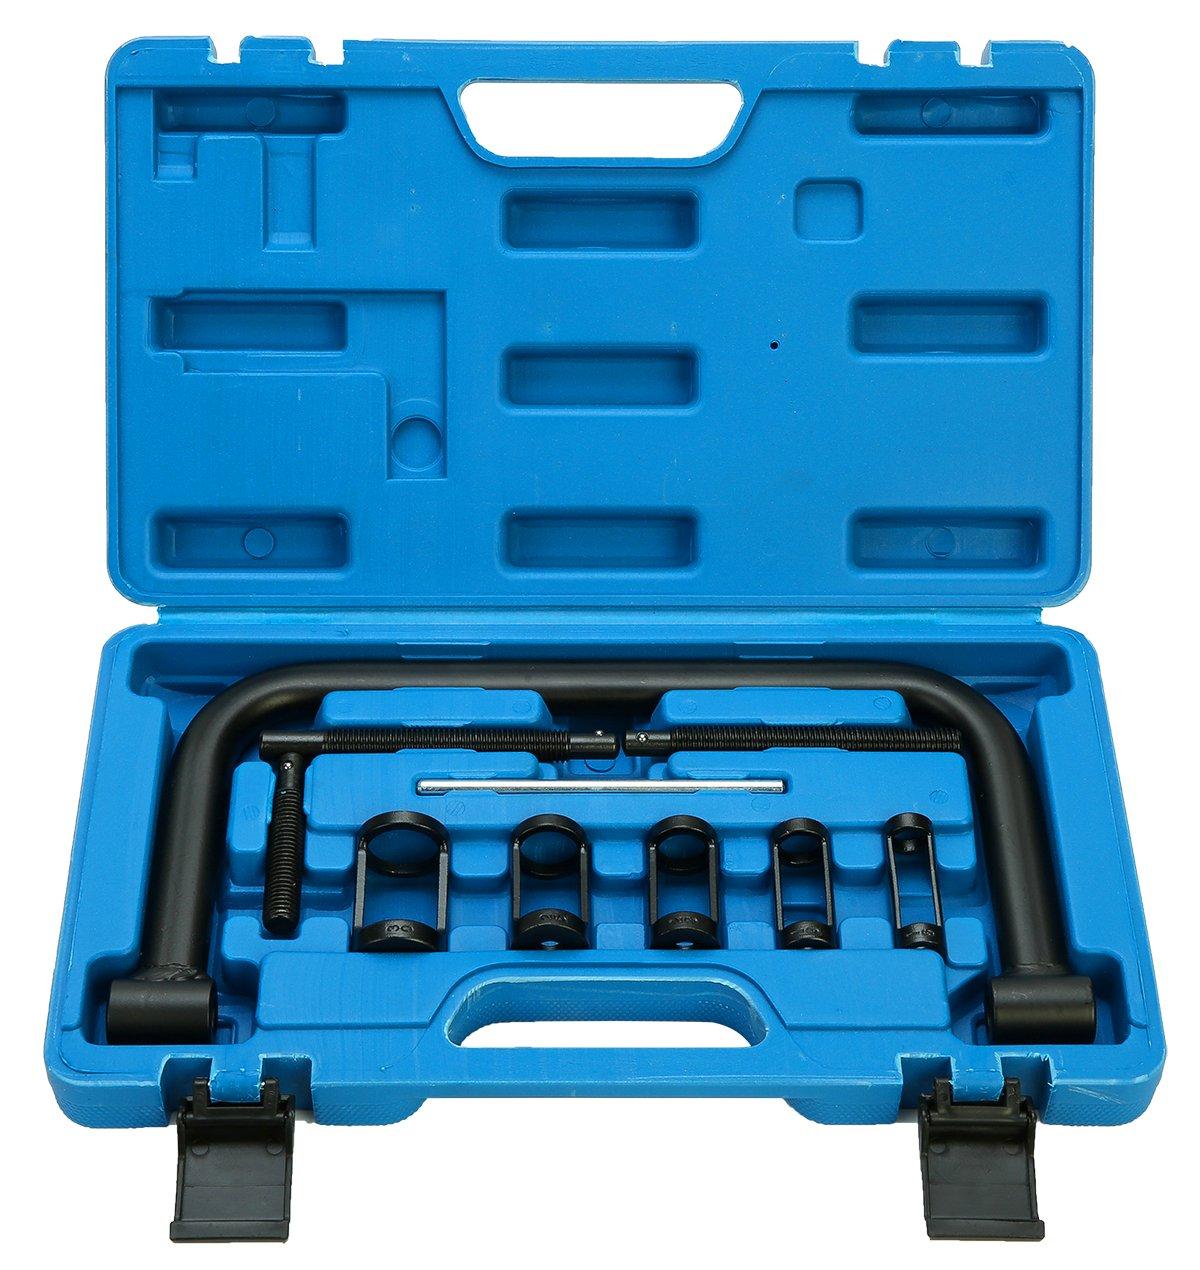 FreeTec 5 in 1 10PCS Auto Valve Spring Compressor Tool Kit Set For Cars Motorbikes